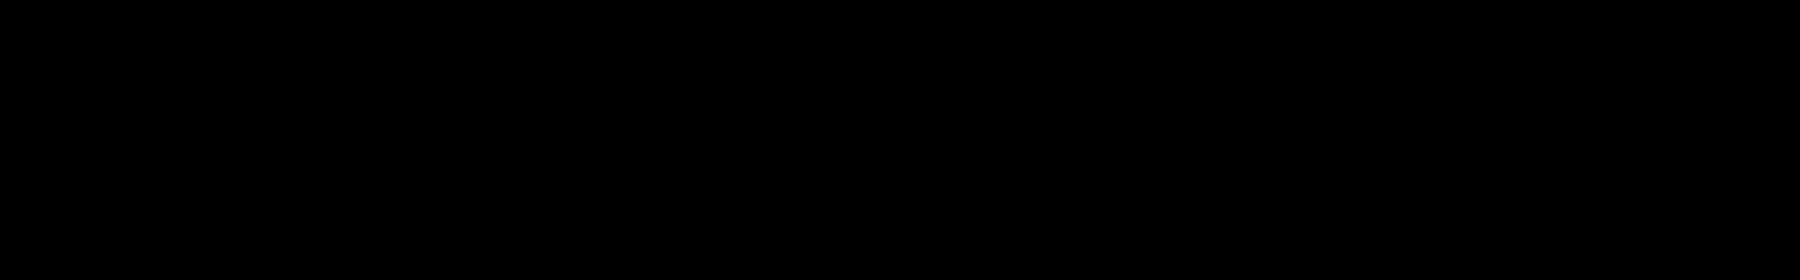 Dubstep Cyborg Cartel audio waveform